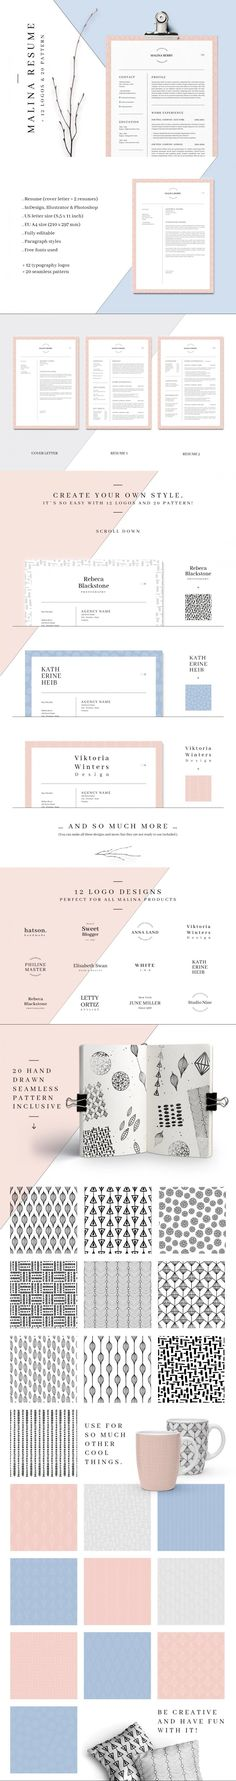 MALINA Resume – 3 Pages + Bonus #CvTemplate #CurriculumVitae #photoshop #rose #template #illustrator #resume #ResumeWriting #class #psd #3pages #minimal #cleanresume #stationery #resumeindesign #ResumeWriting #CvDesign #BestResumeFormat #msword Resume Design Template, Cv Template, Resume Templates, Stationery Printing, Stationery Design, Cv Design, Logo Design, Typography Logo, Lettering